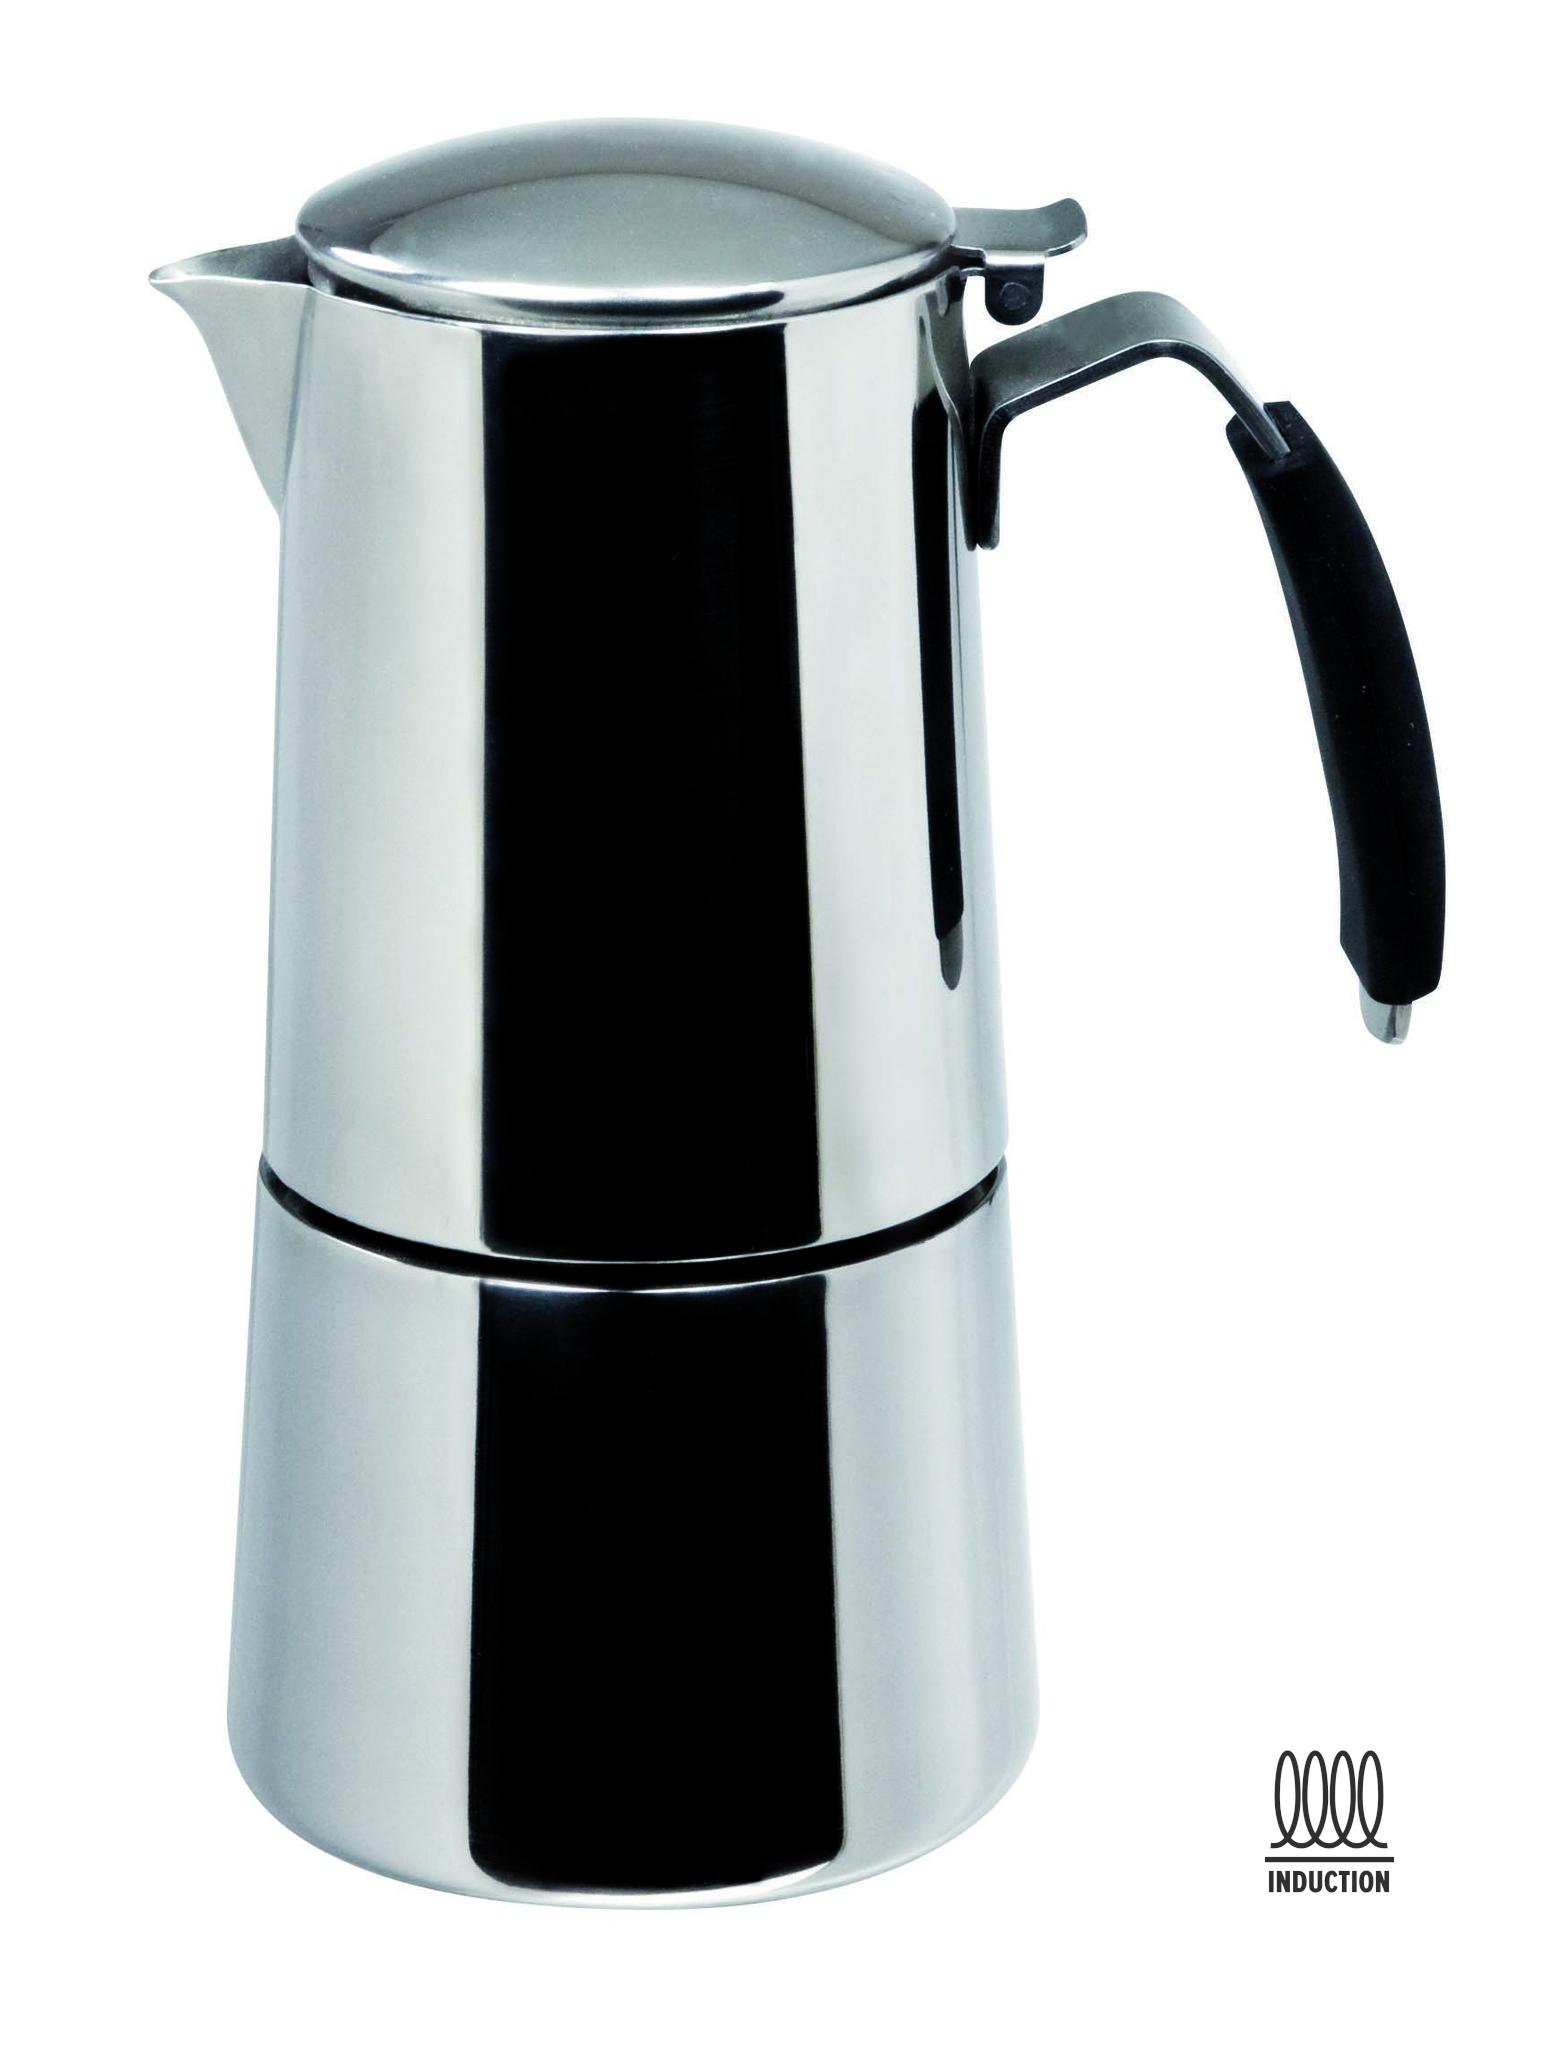 "ILSA Espressokocher ""Omnia"" aus Edelstahl 15cl / 2 Tassen"